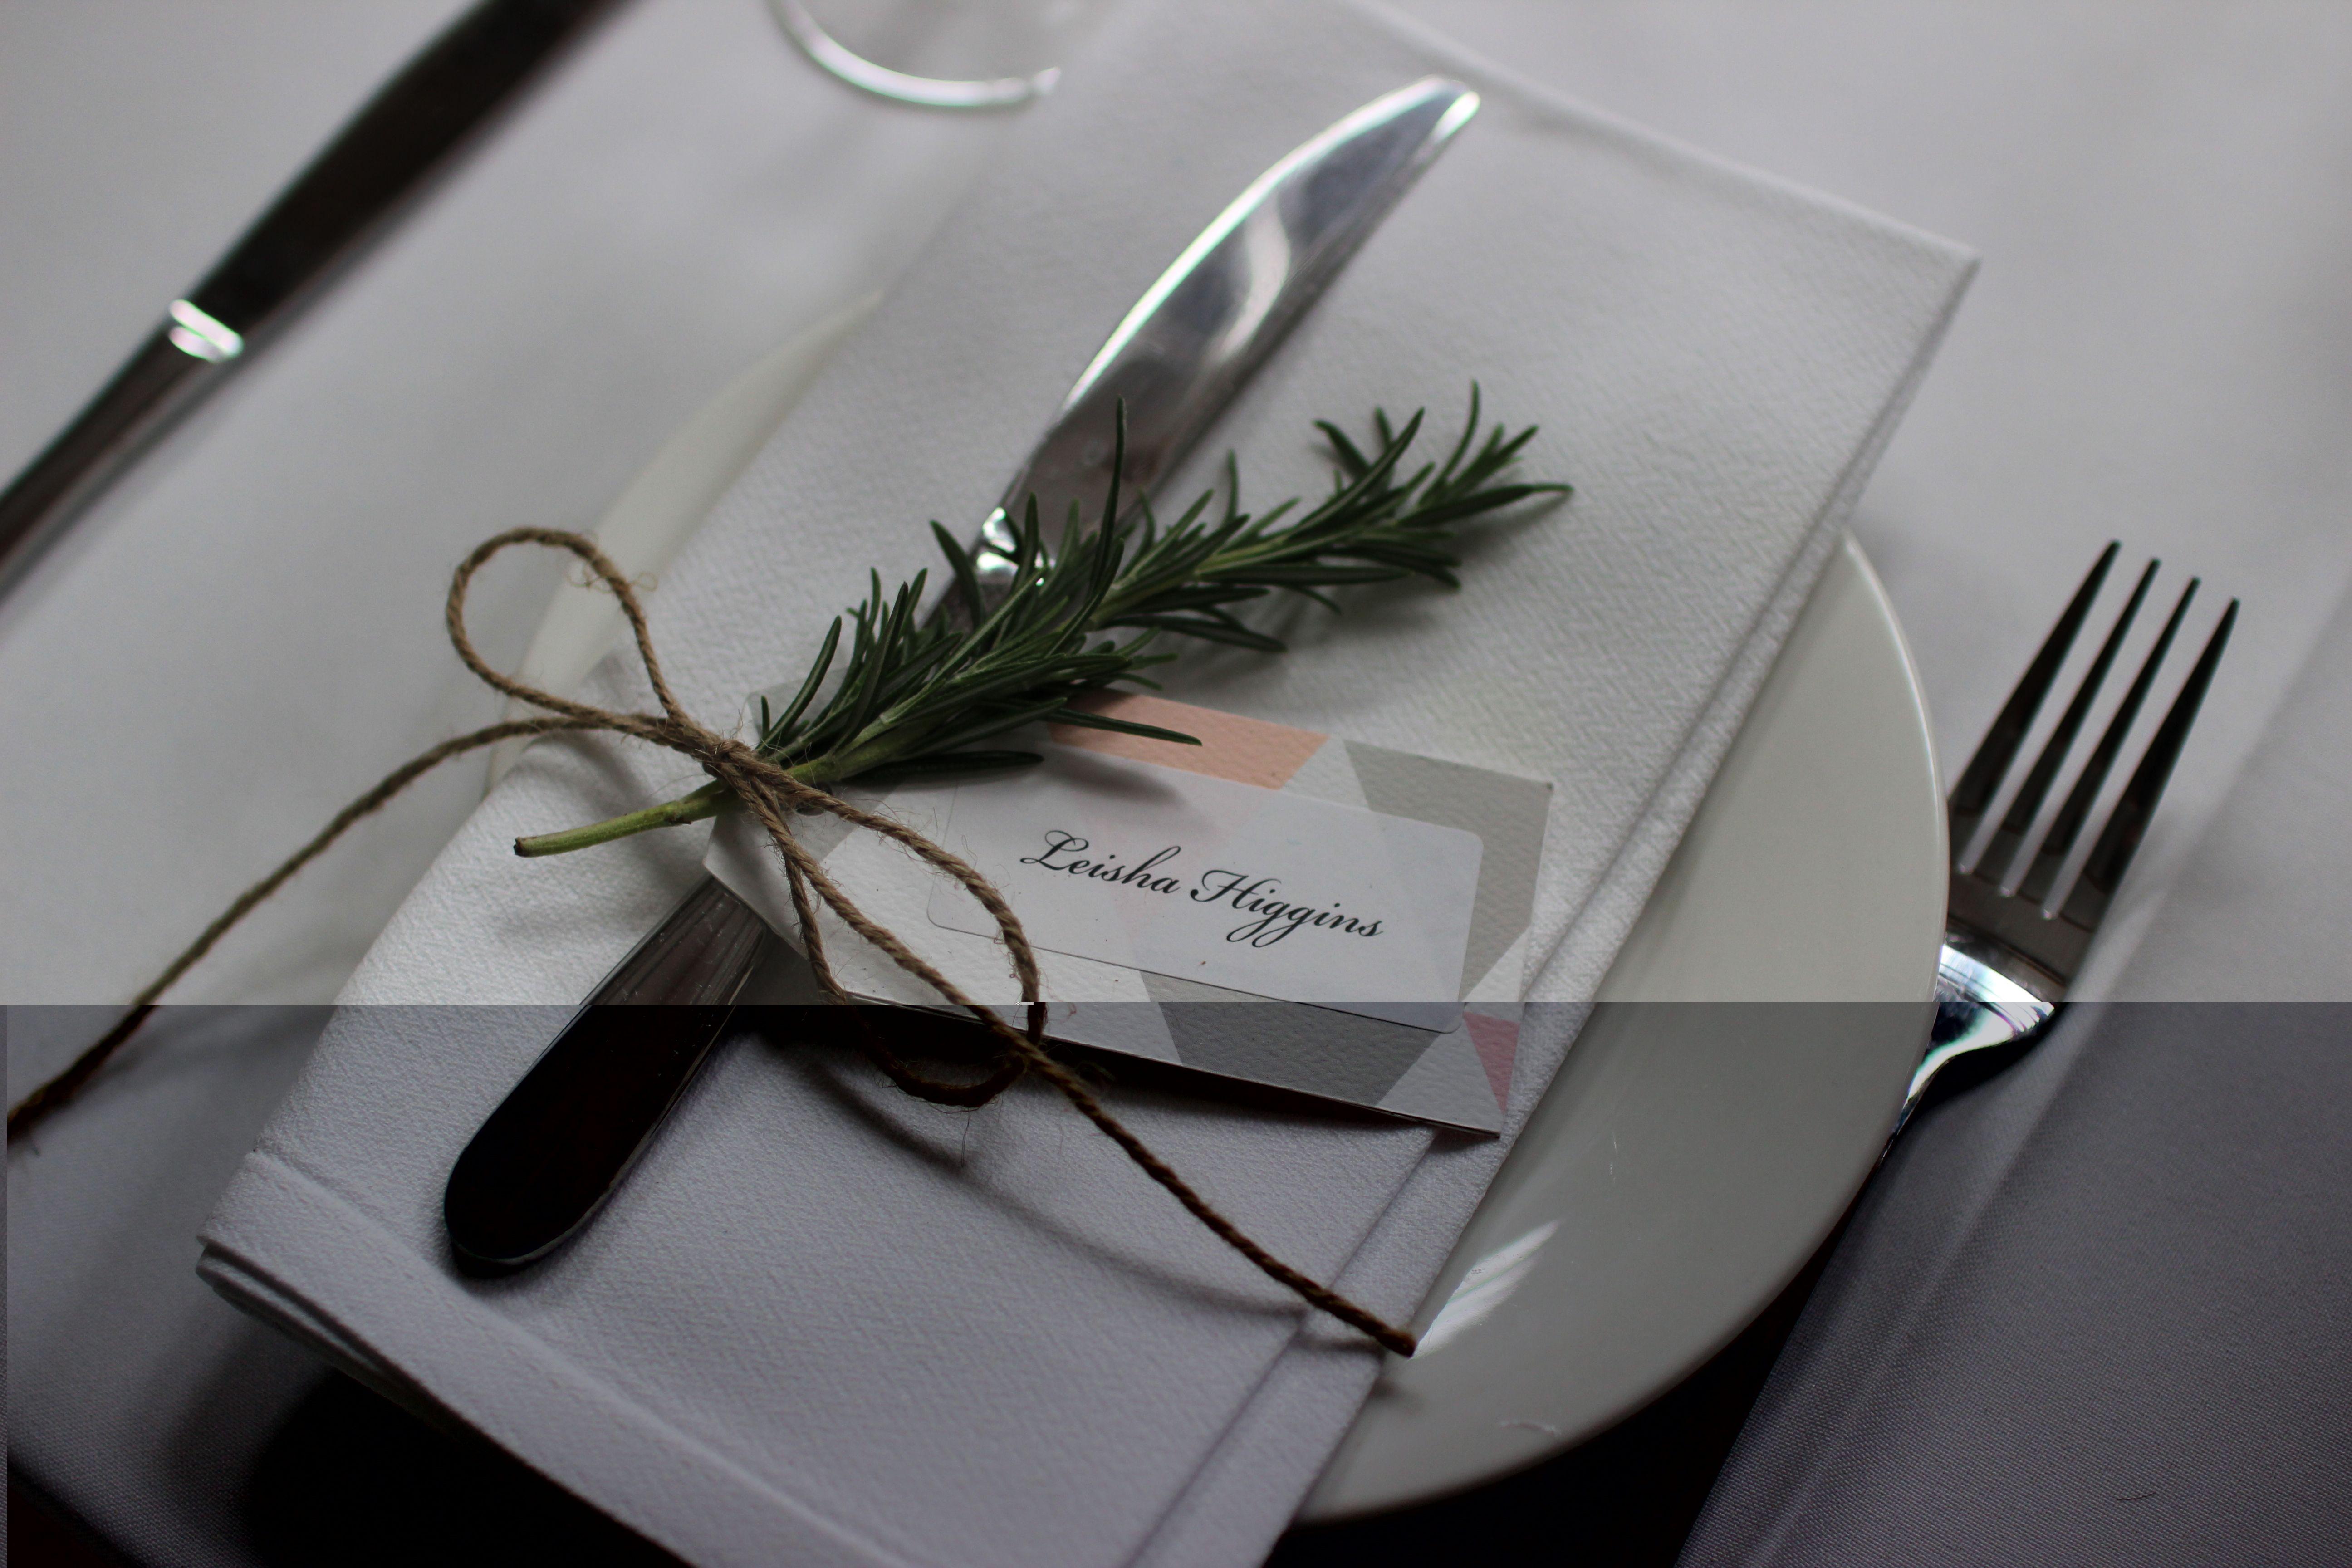 Rustic Wedding Name tags table setting | My Wedding | Pinterest ...